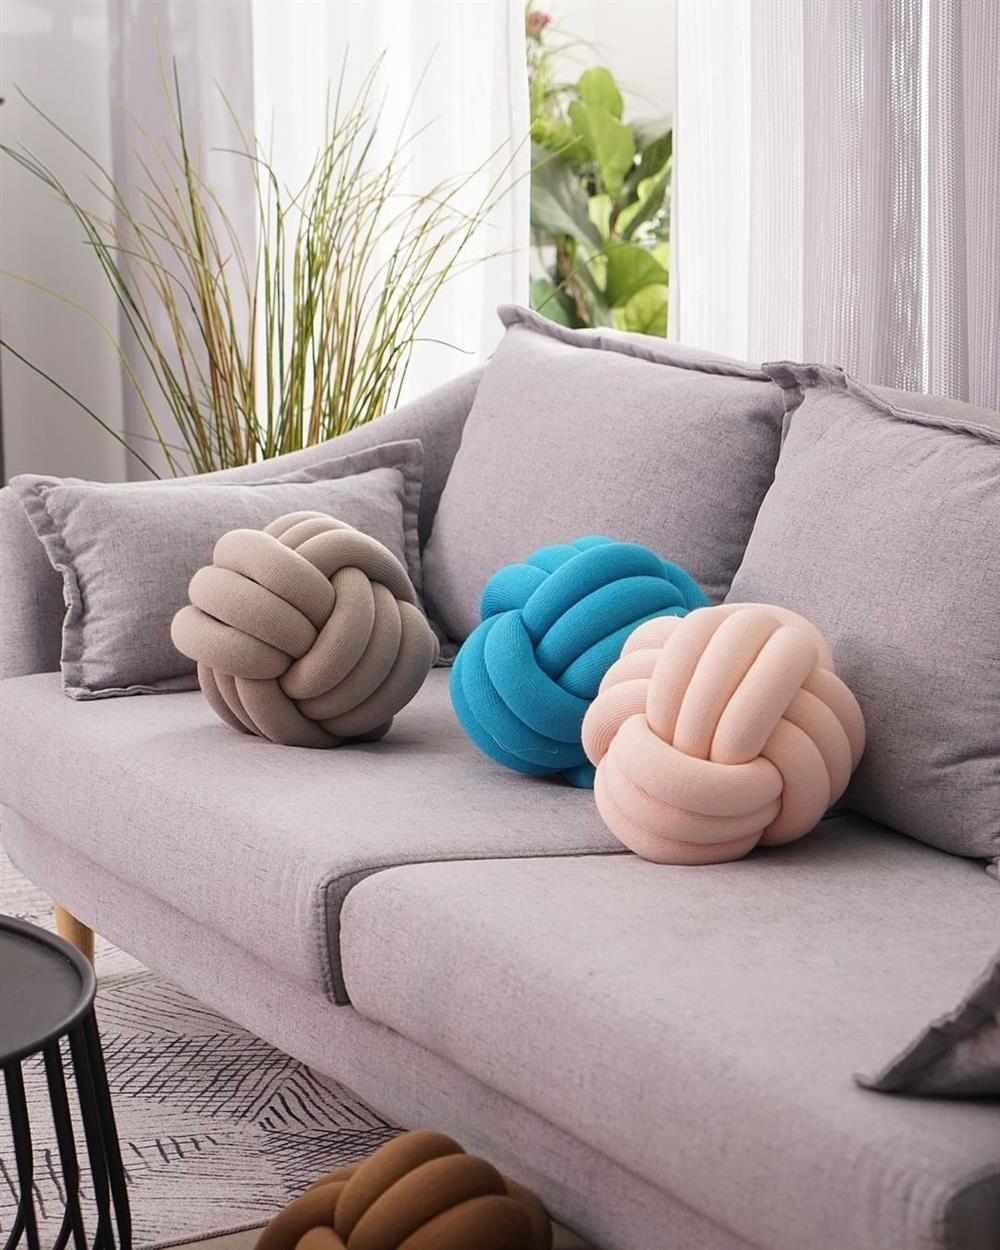 almofada no sala sofa